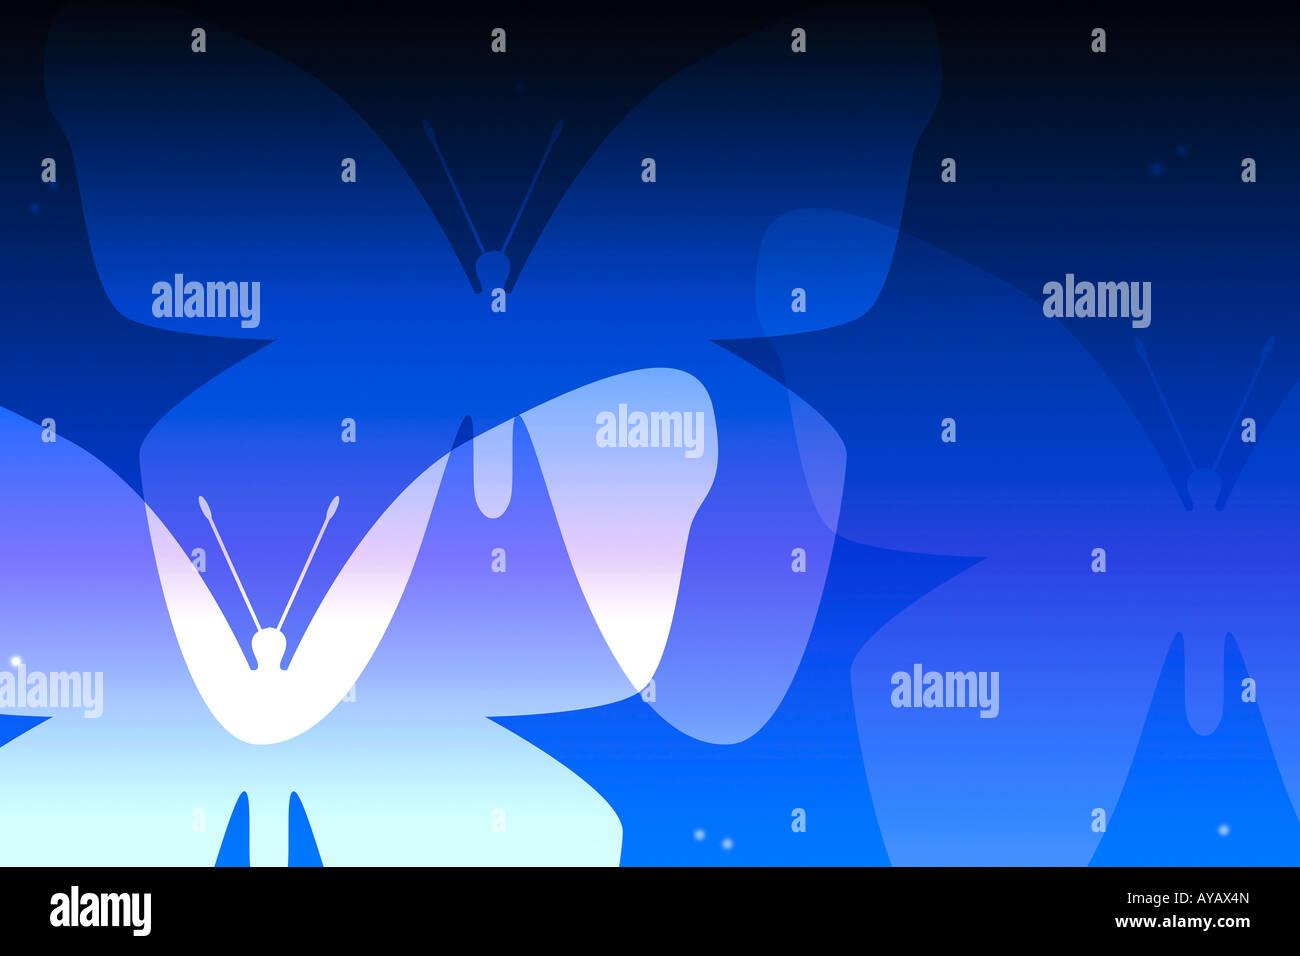 Illustration of butterflies - Stock Image